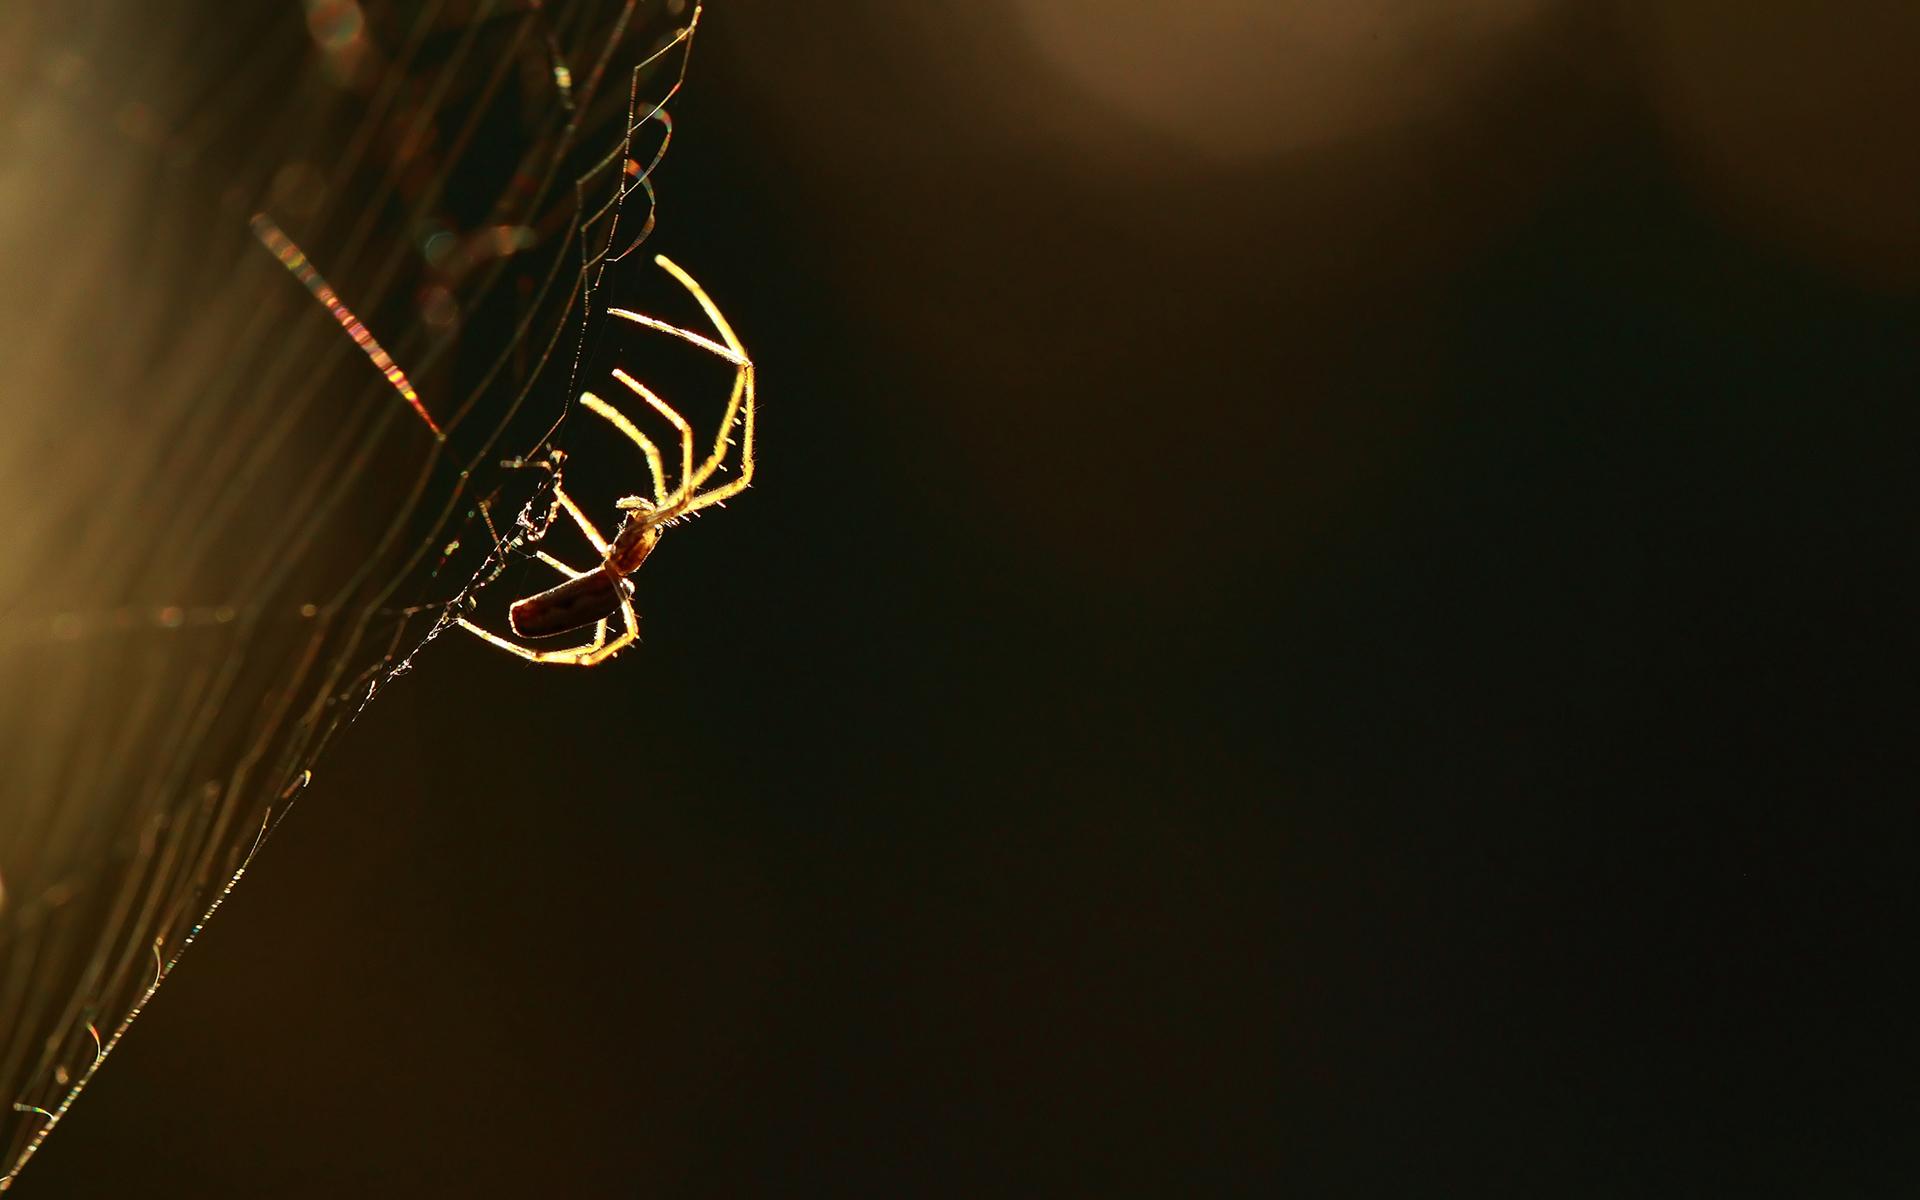 Spider Macro Spider Web wallpaper 1920x1200 79578 1920x1200